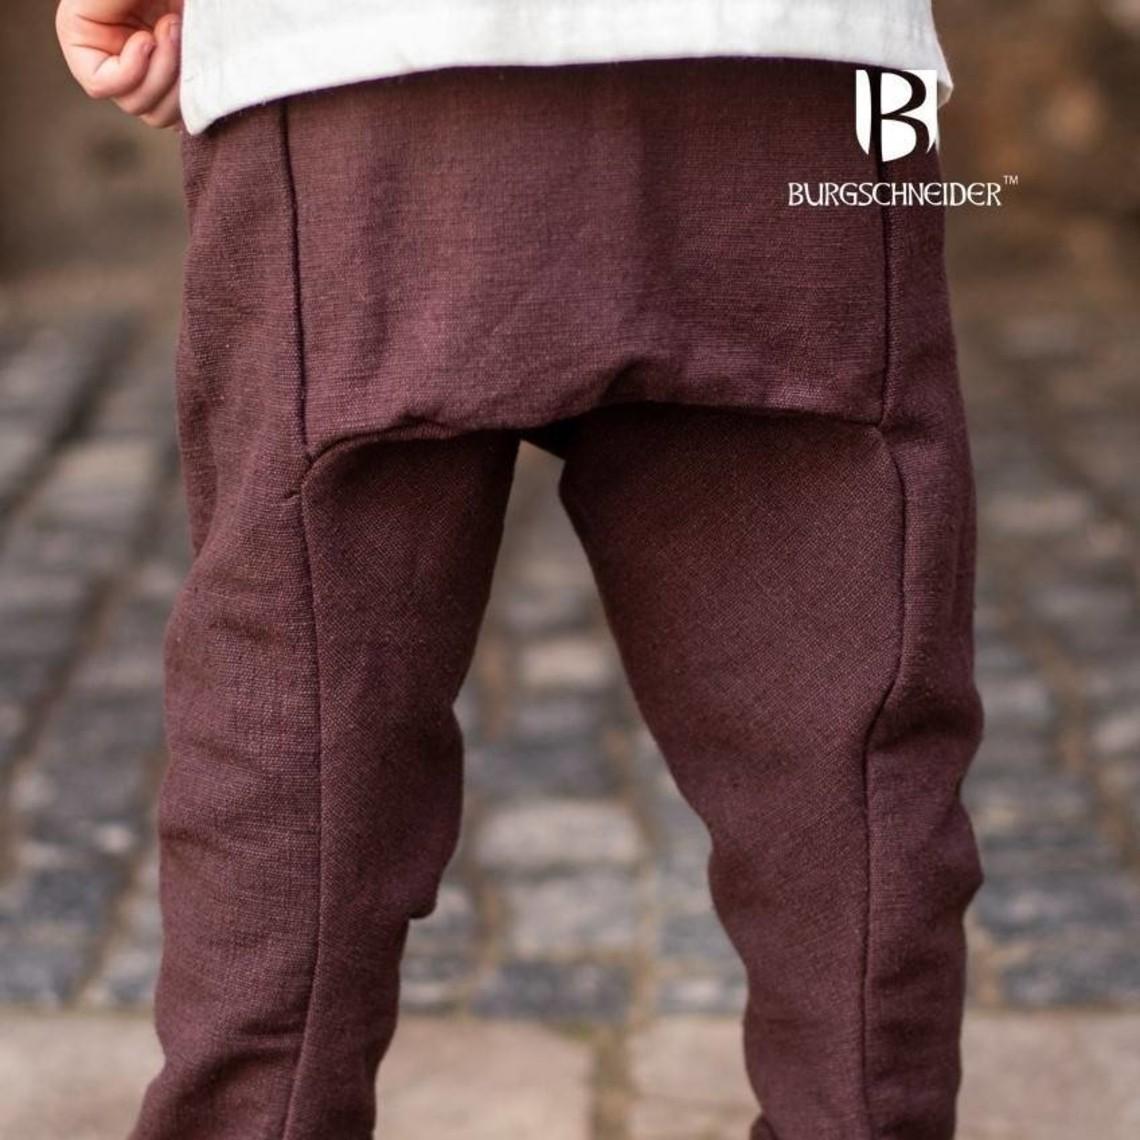 Burgschneider Pantalones Thorsberg niños Ragnarsson, marrón